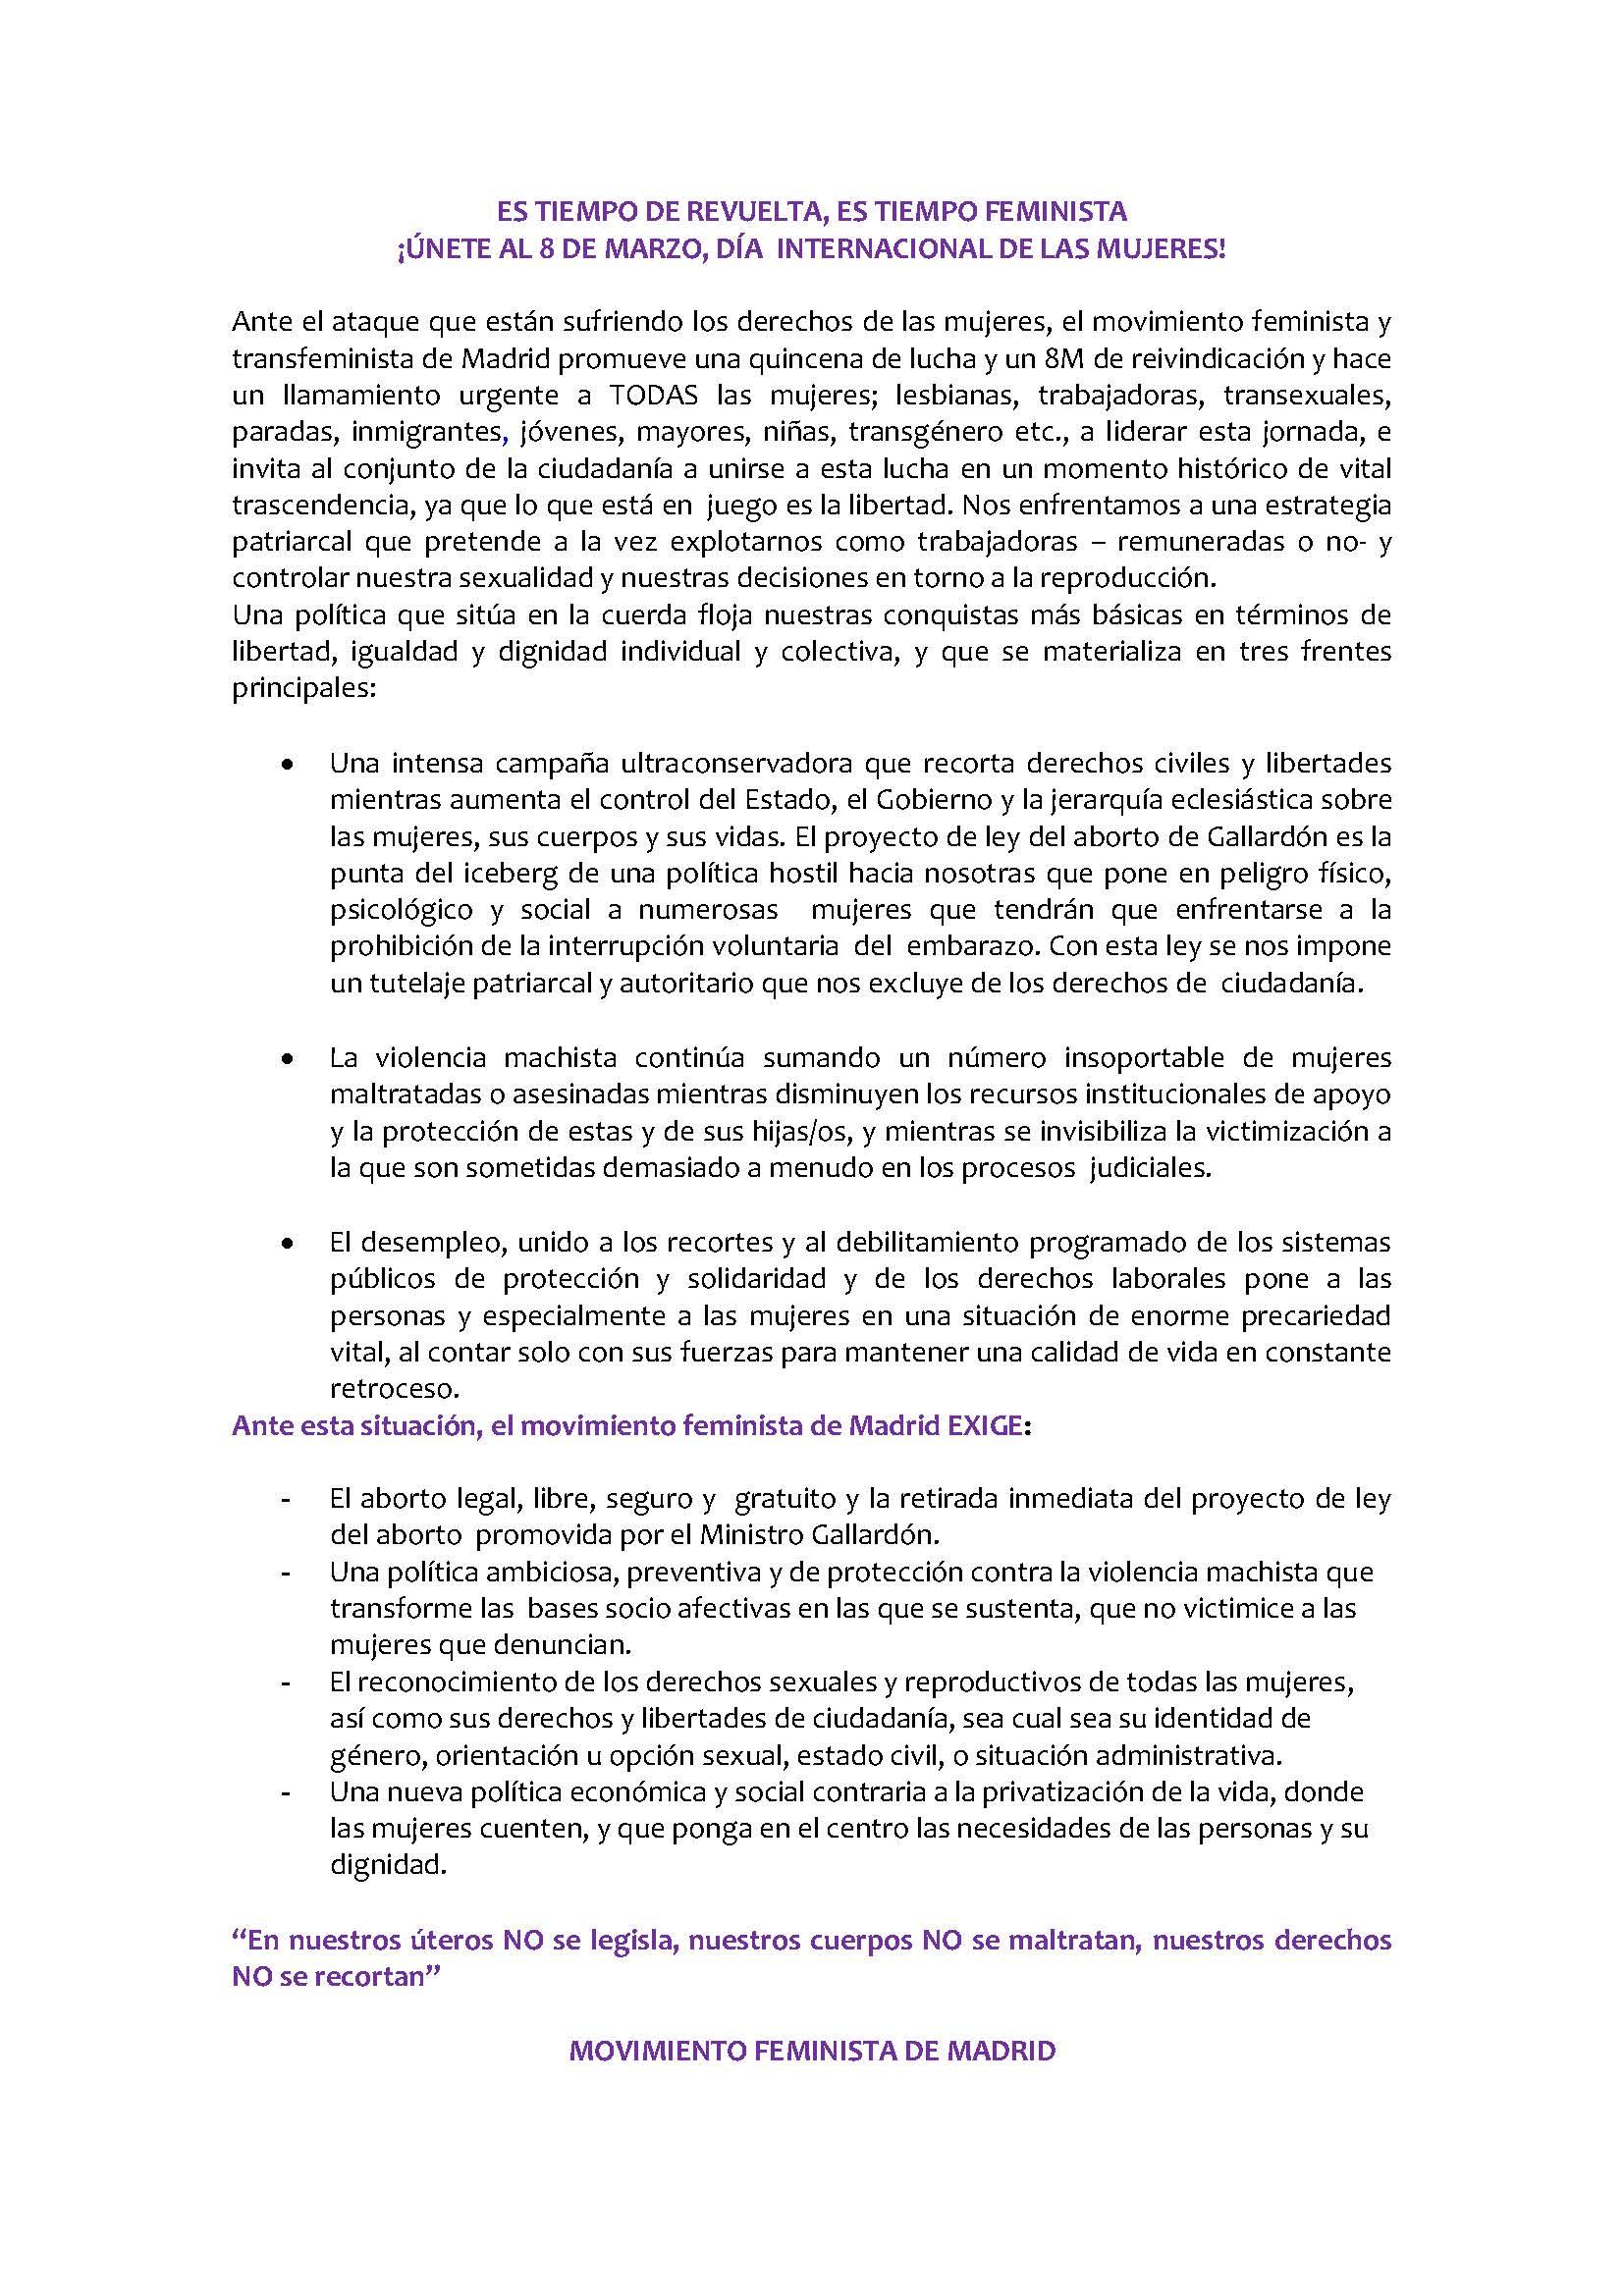 Manifiesto_8M_24022014.jpg